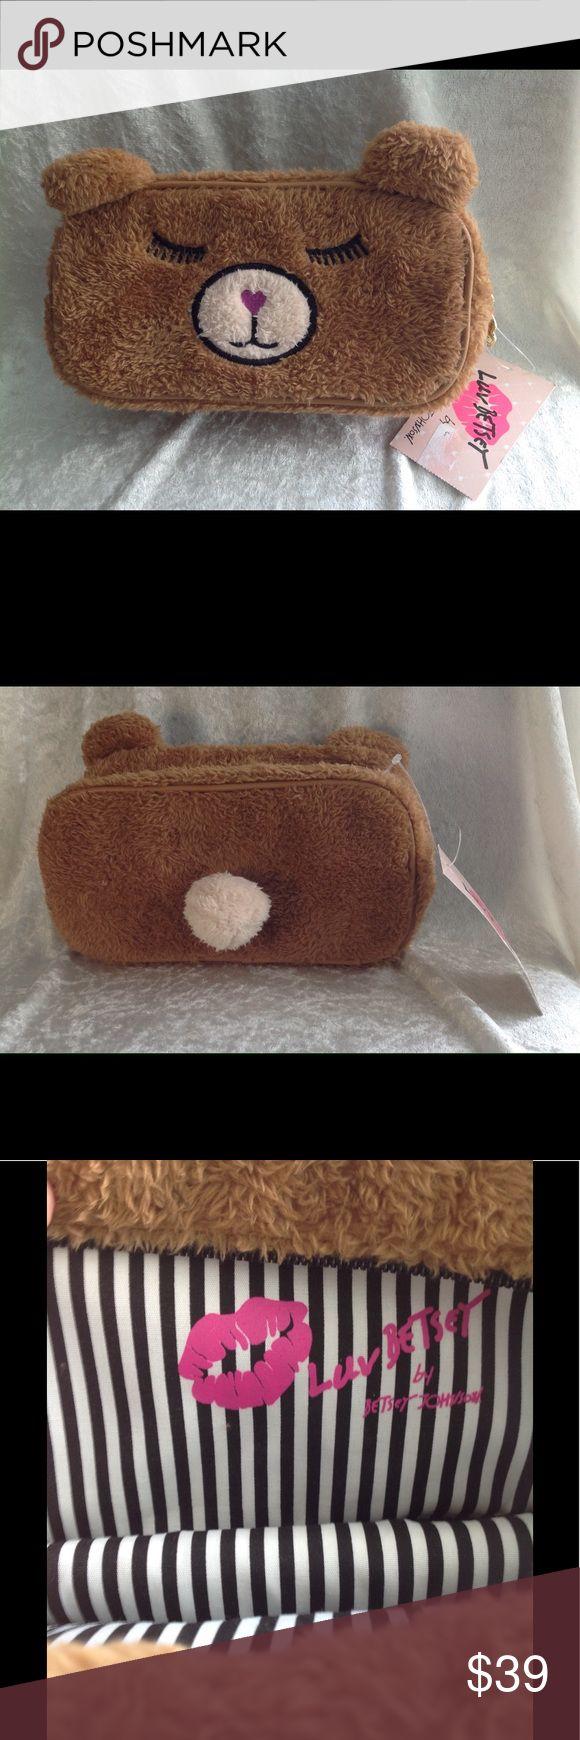 BETSEY JOHNSON LB BEAR 🐻 💕BROWN CLUTCH BAG BETSEY JOHNSON LB BEAR 🐻 💕BROWN CLUTCH BAG Betsey Johnson Bags Clutches & Wristlets